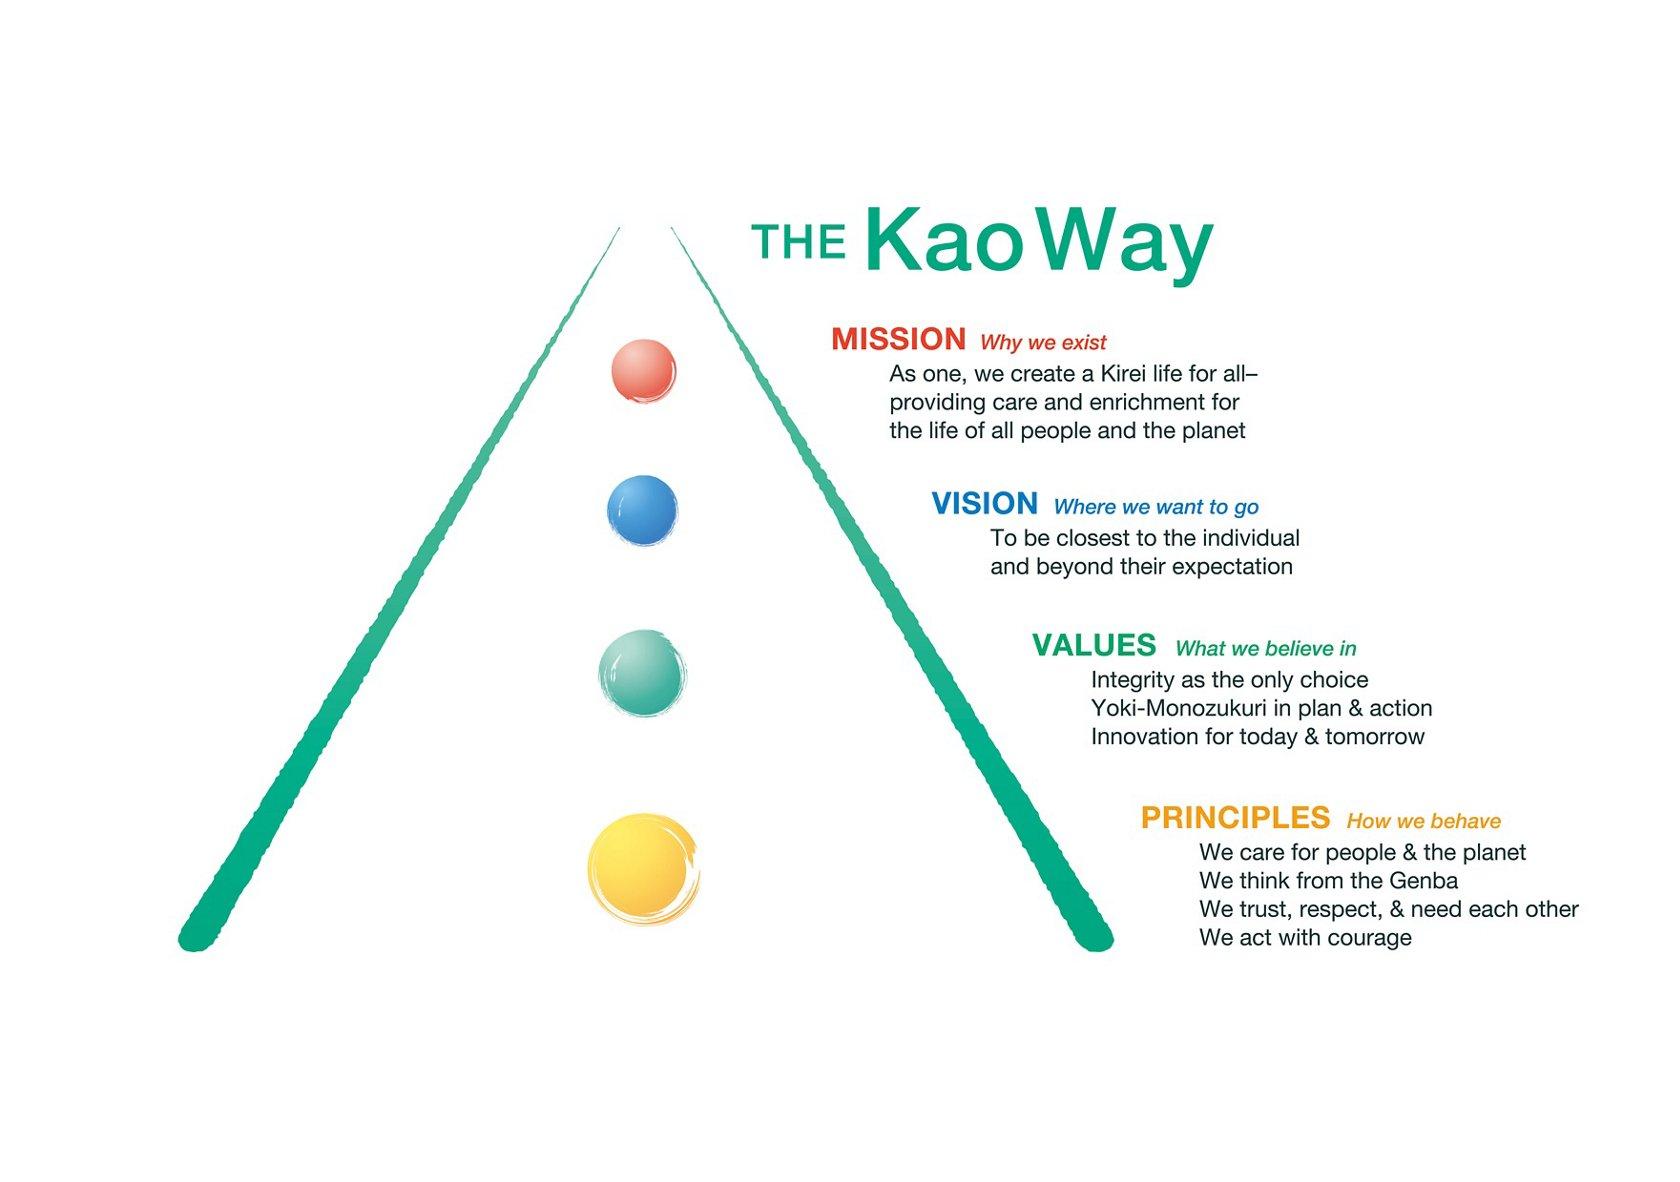 Kao   The Kao Way corporate philosophy